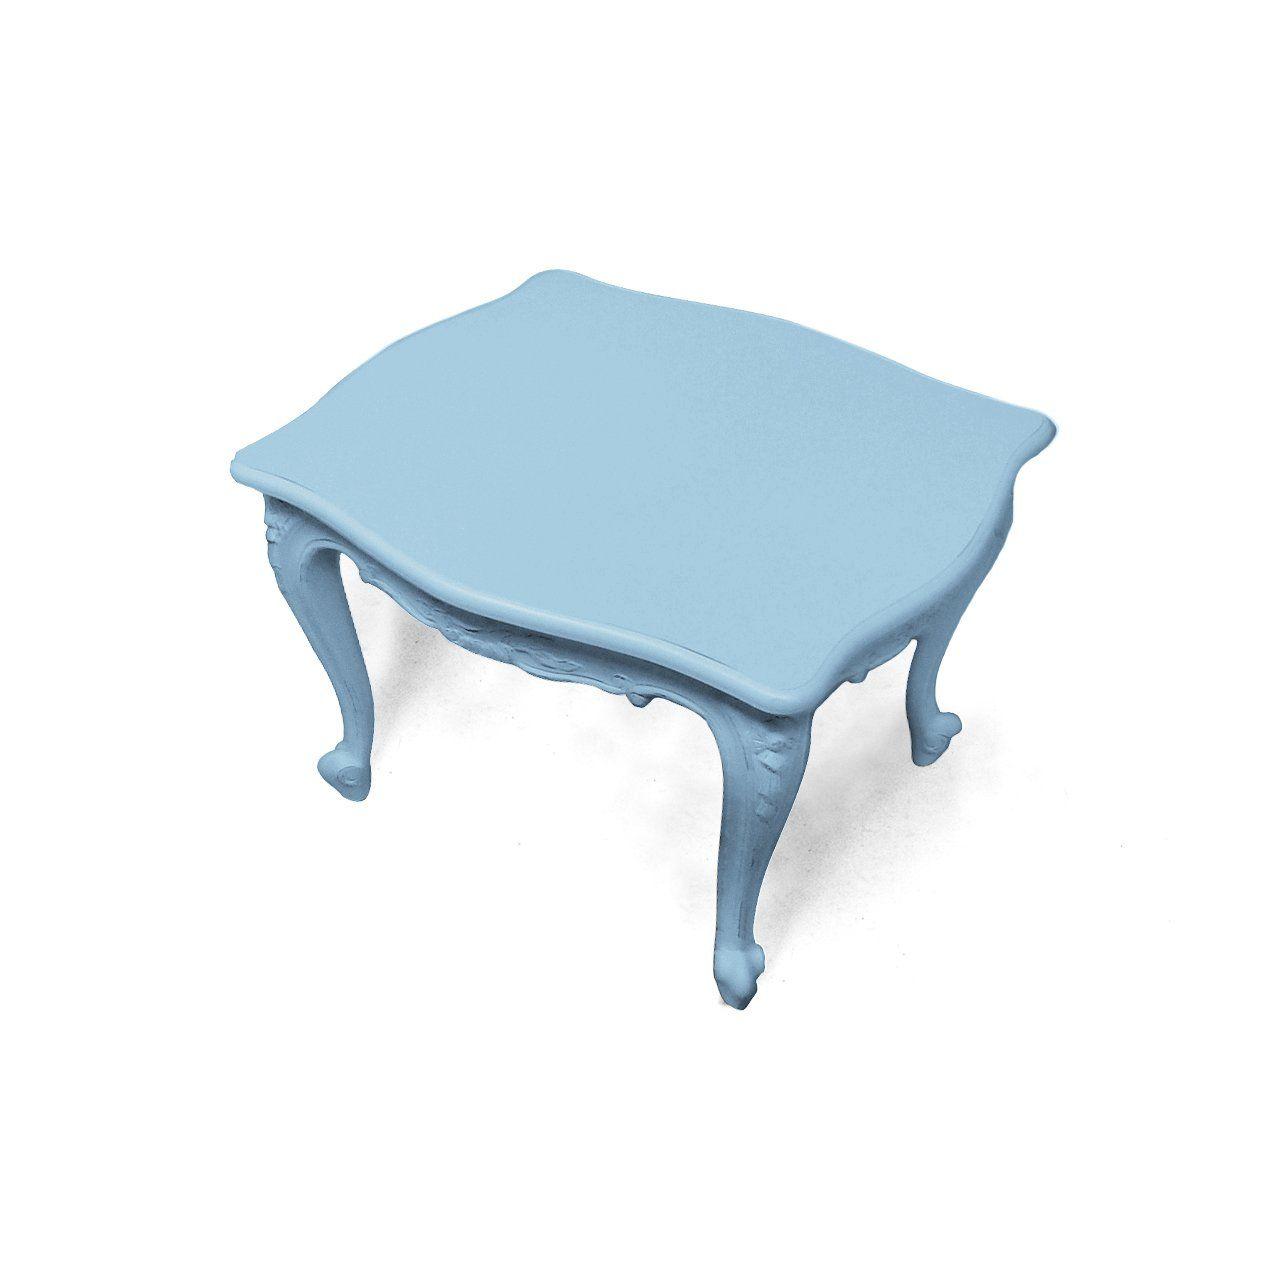 New Baroque Design Side Table Elastomer Rectangular Commercial Plastic Fantastic By Jasper Van Grootel